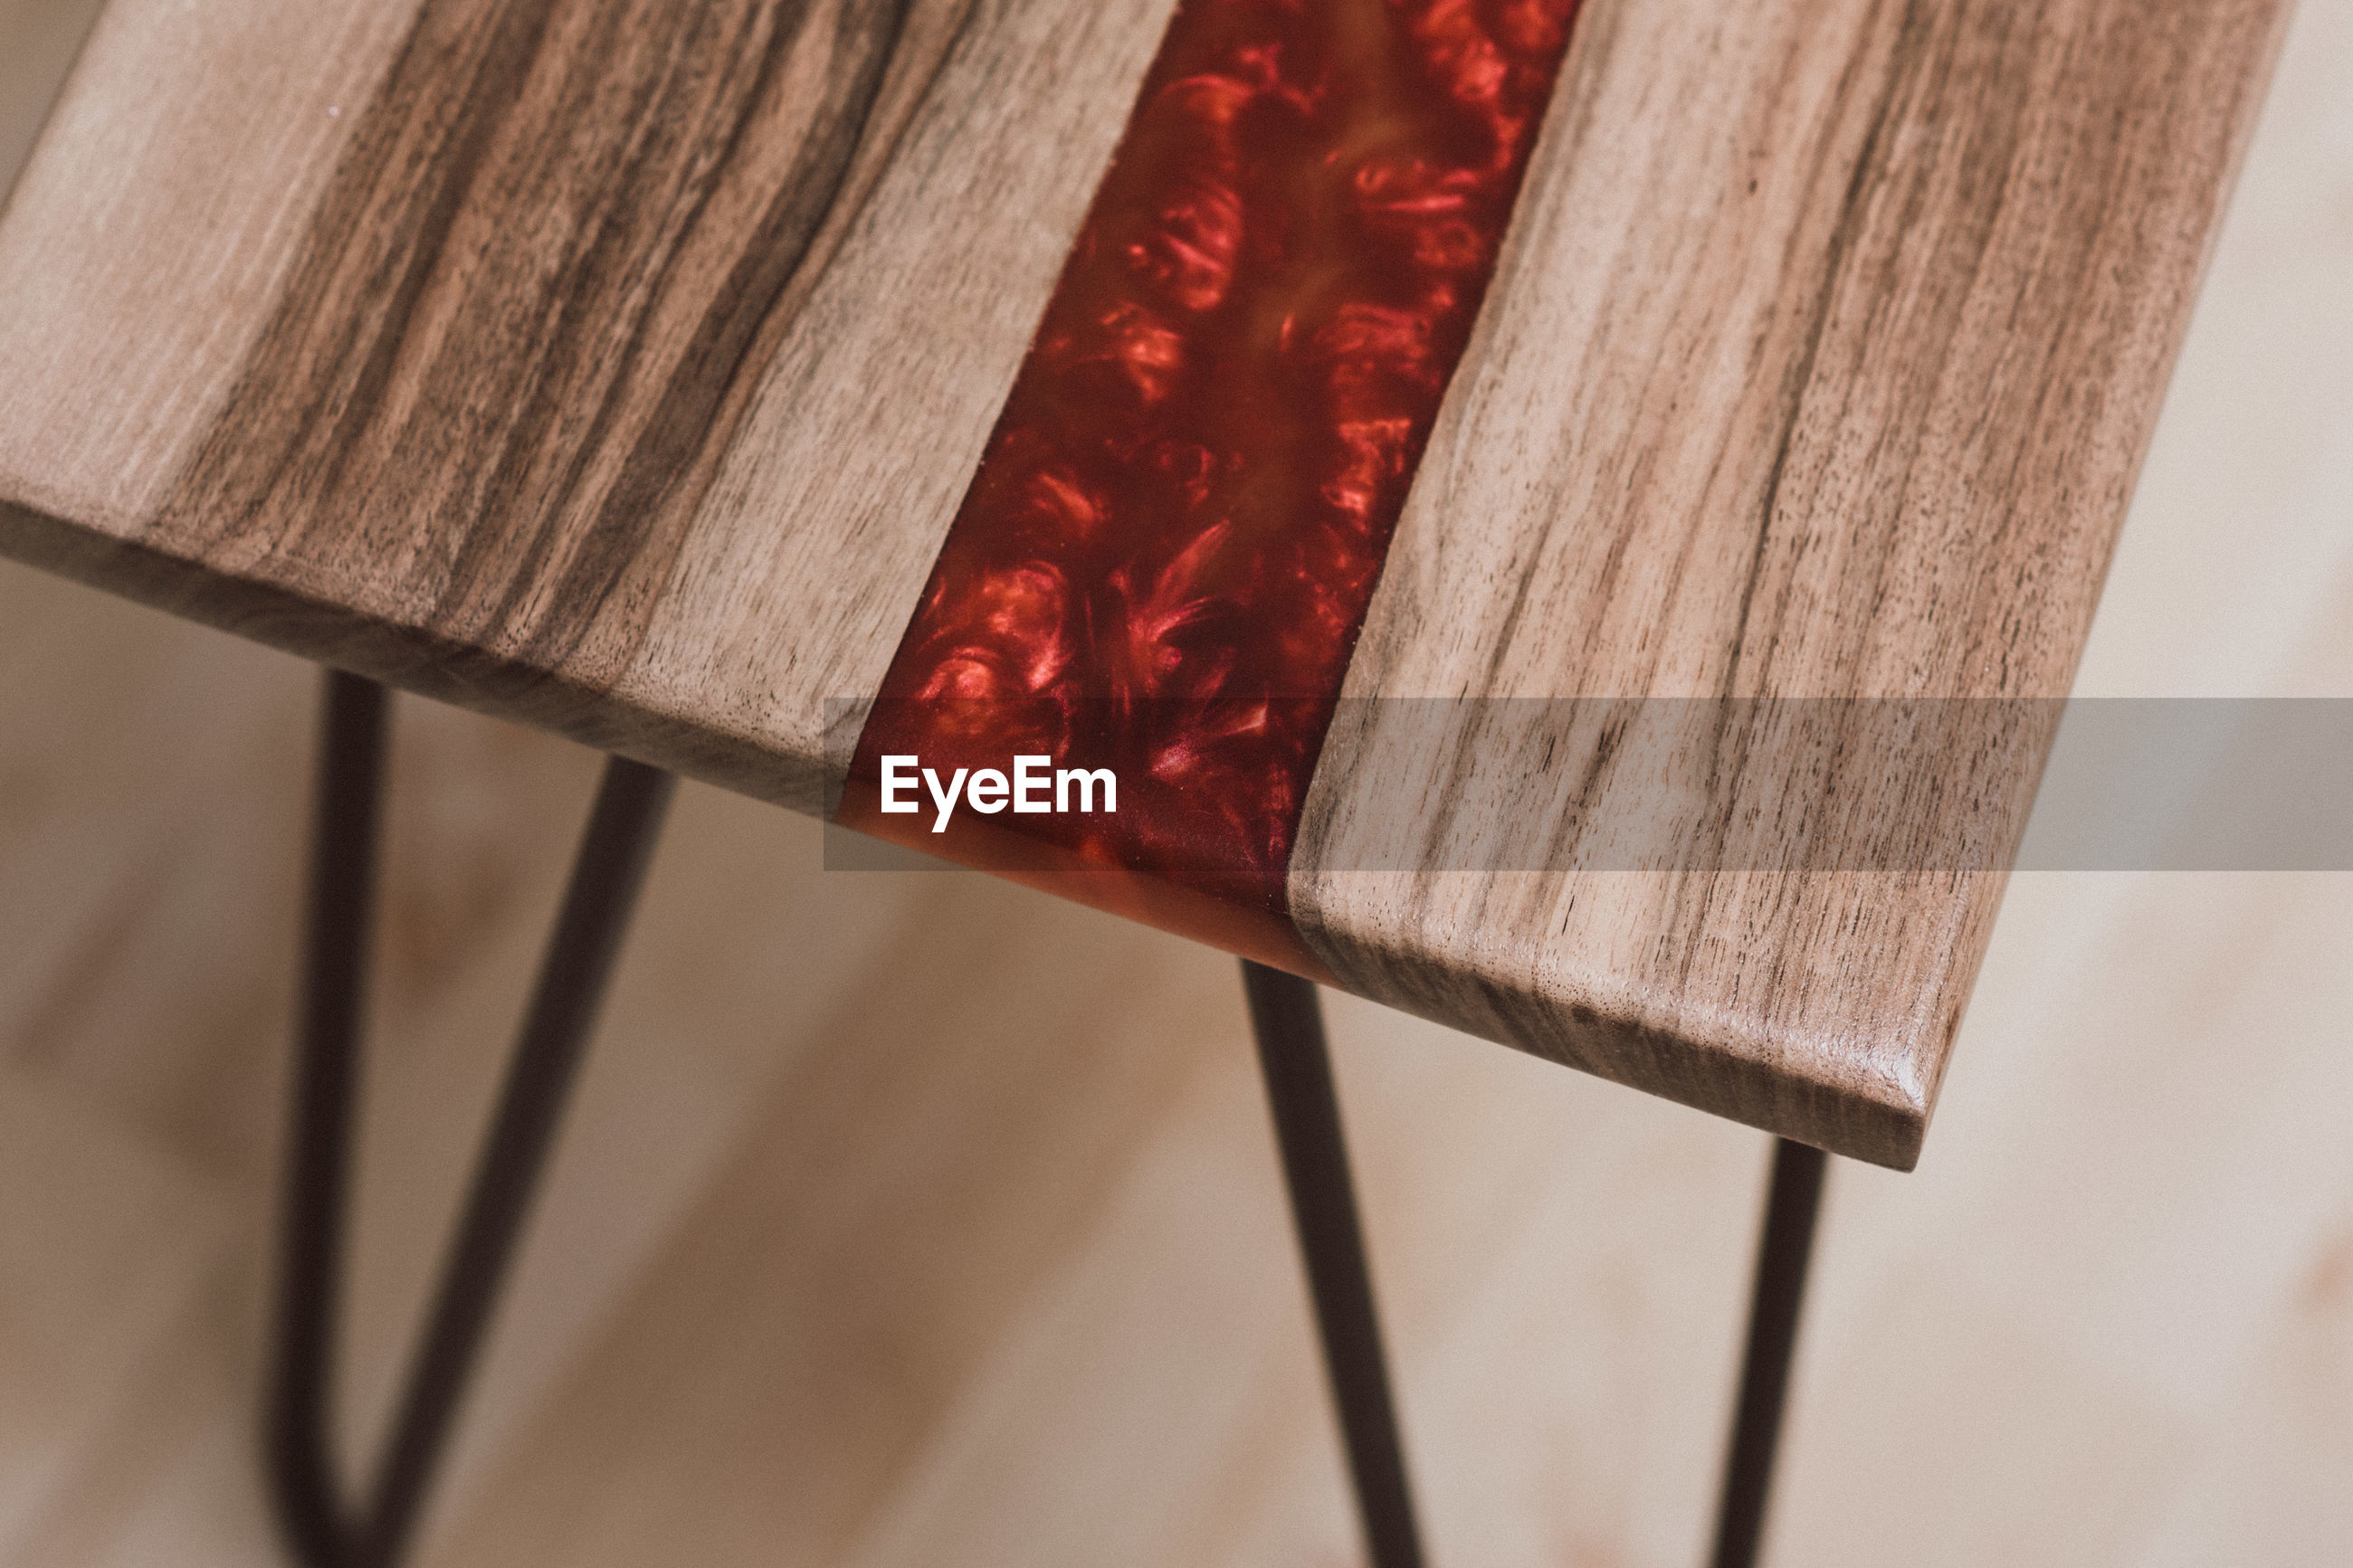 High angle view of resin on table